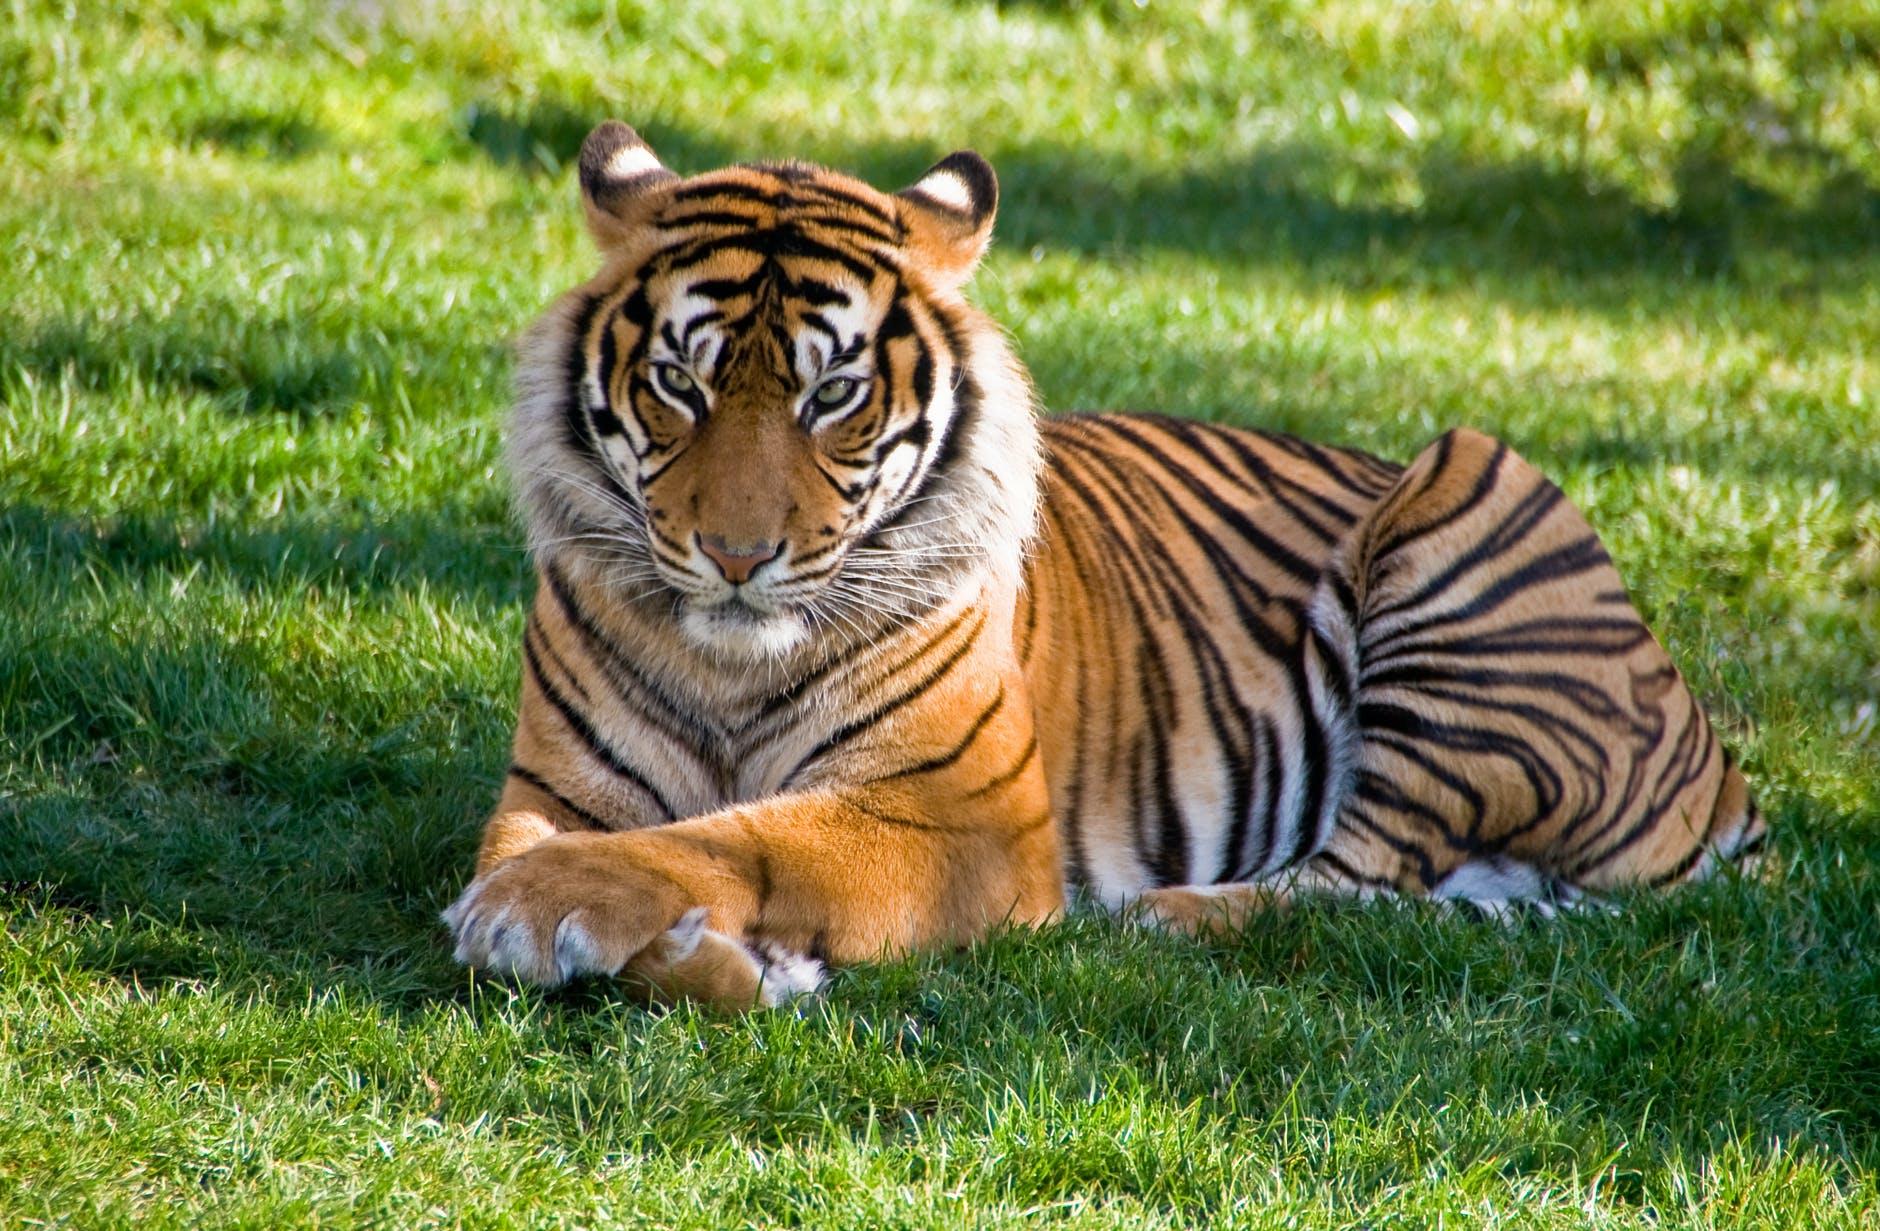 В крымском сафари-парке «Тайган» тигр откусил ребенку палец